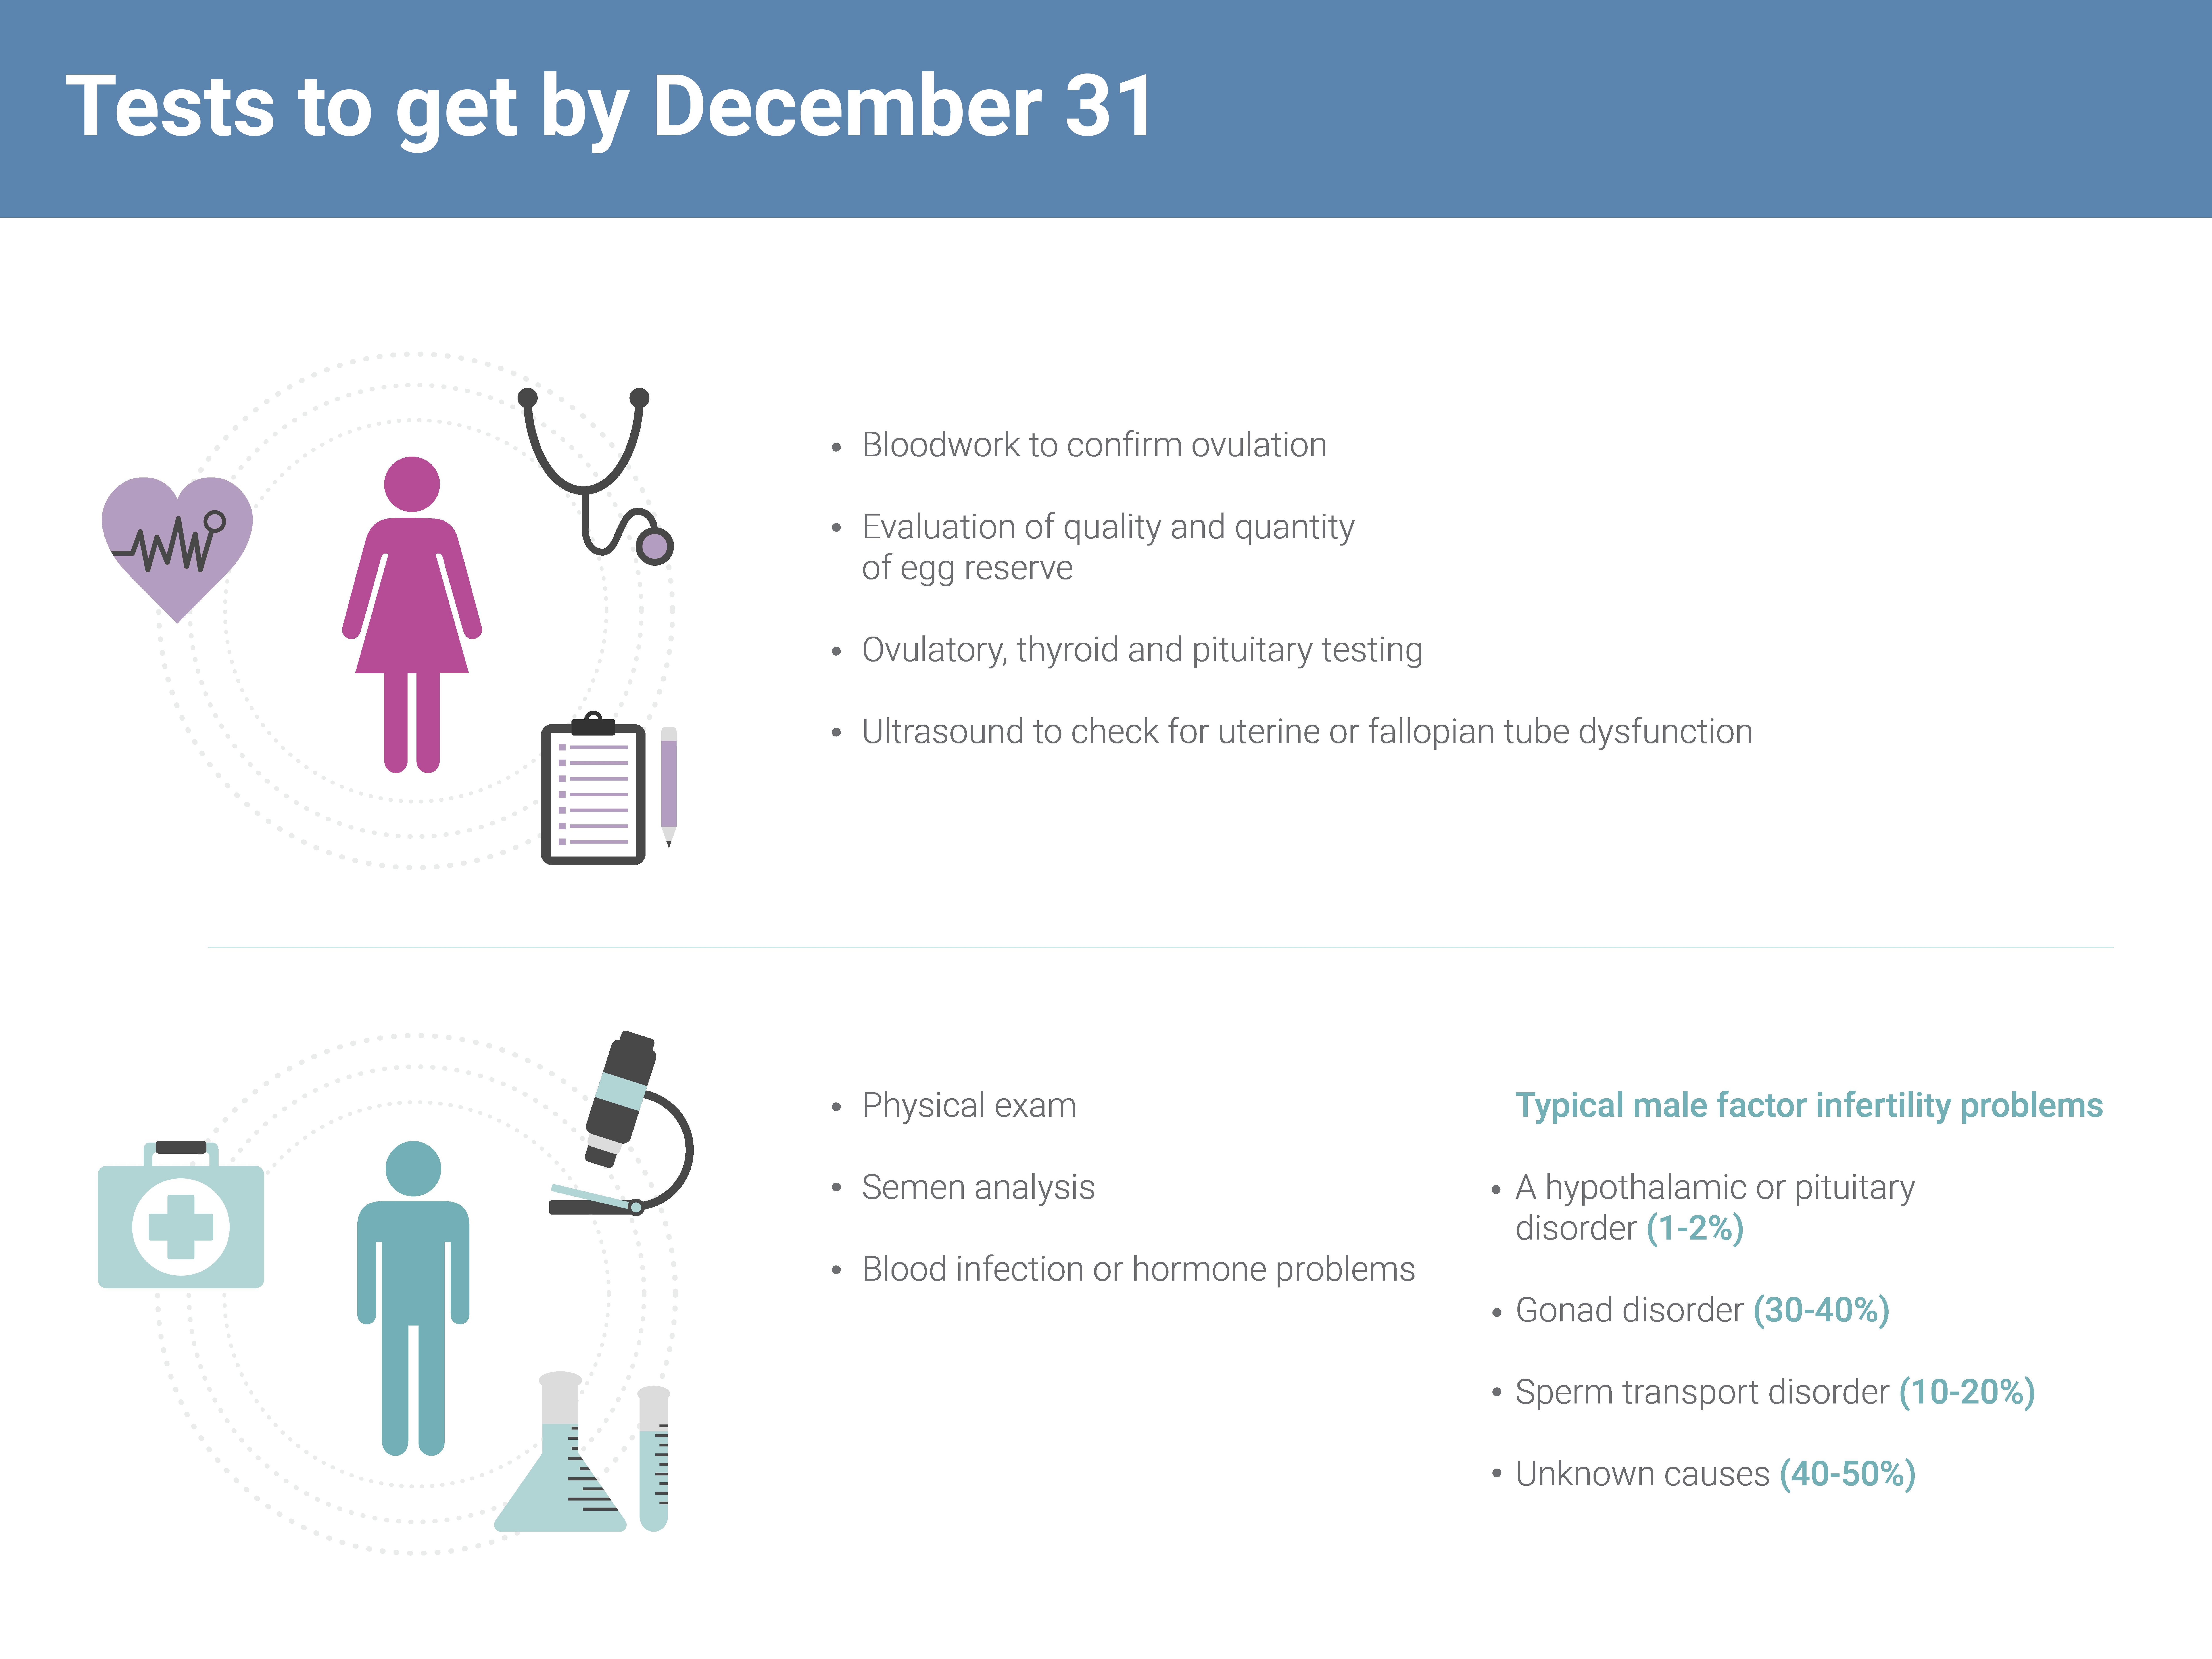 LGBTQ family building fertility tests